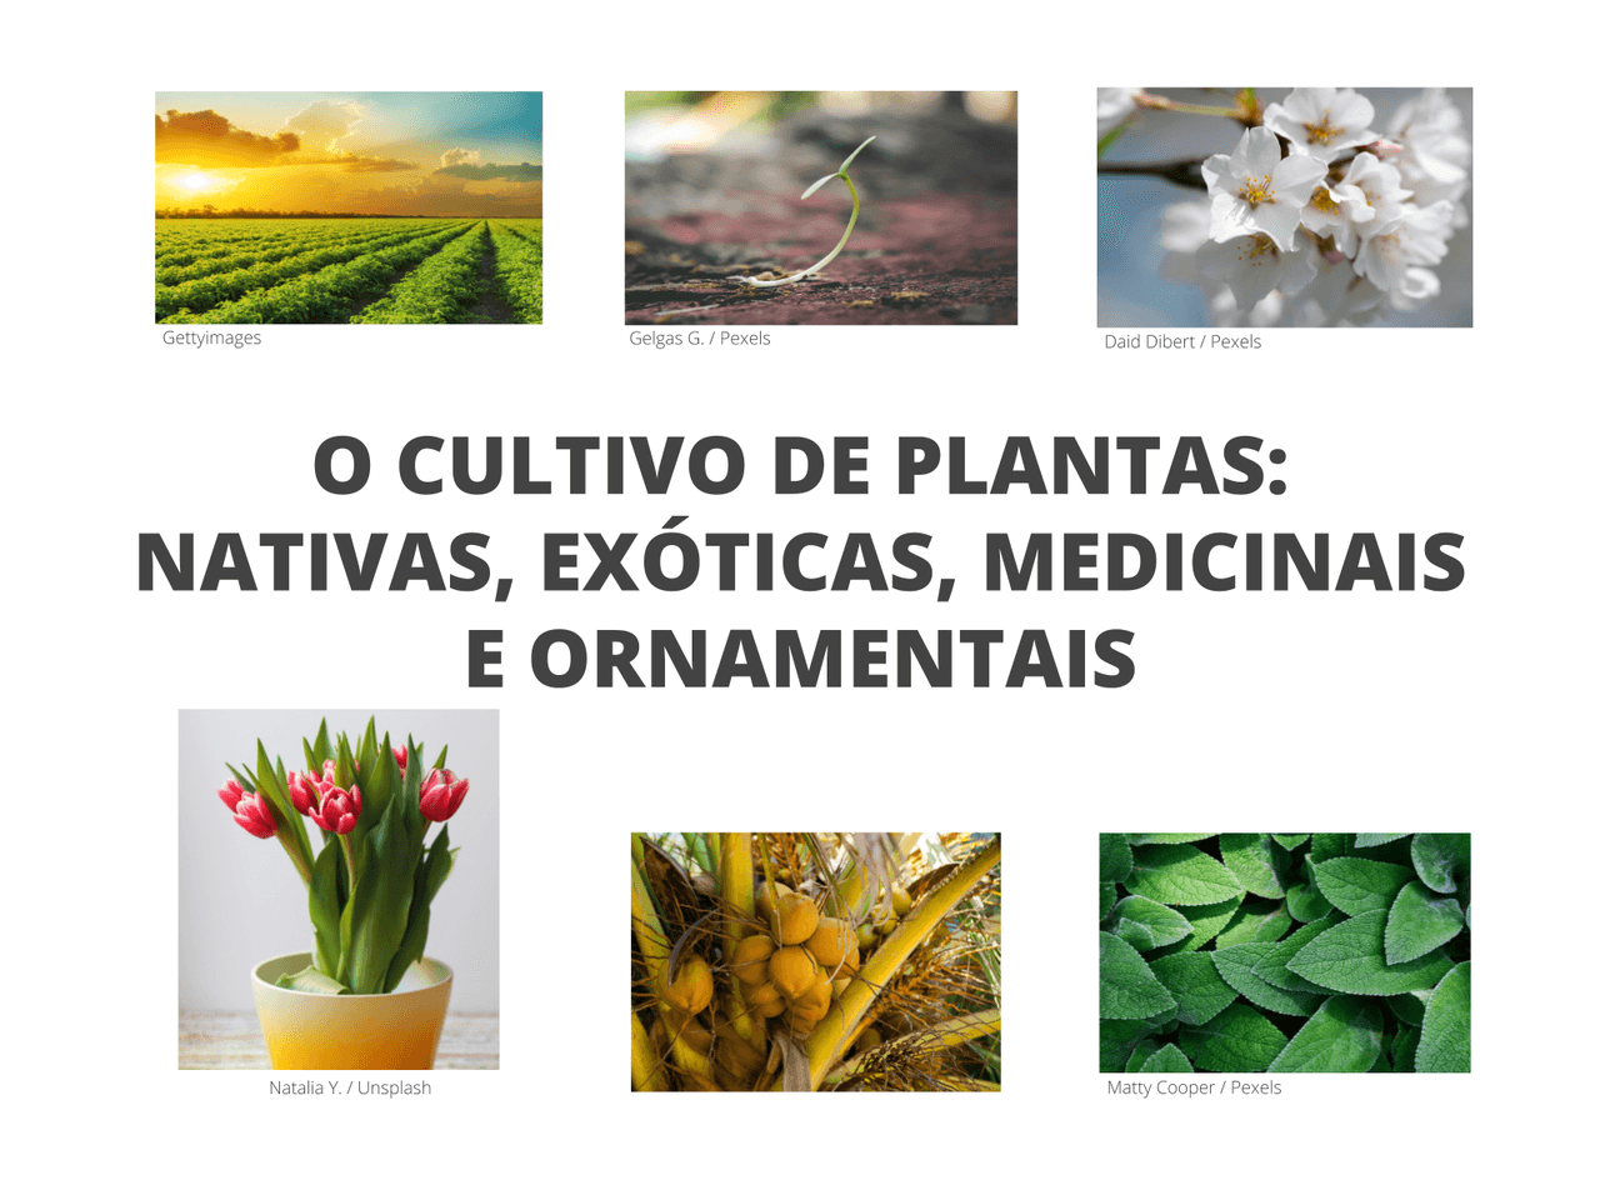 O CULTIVO DE PLANTAS: NATIVAS, EXÓTICAS, MEDICINAIS E ORNAMENTAIS